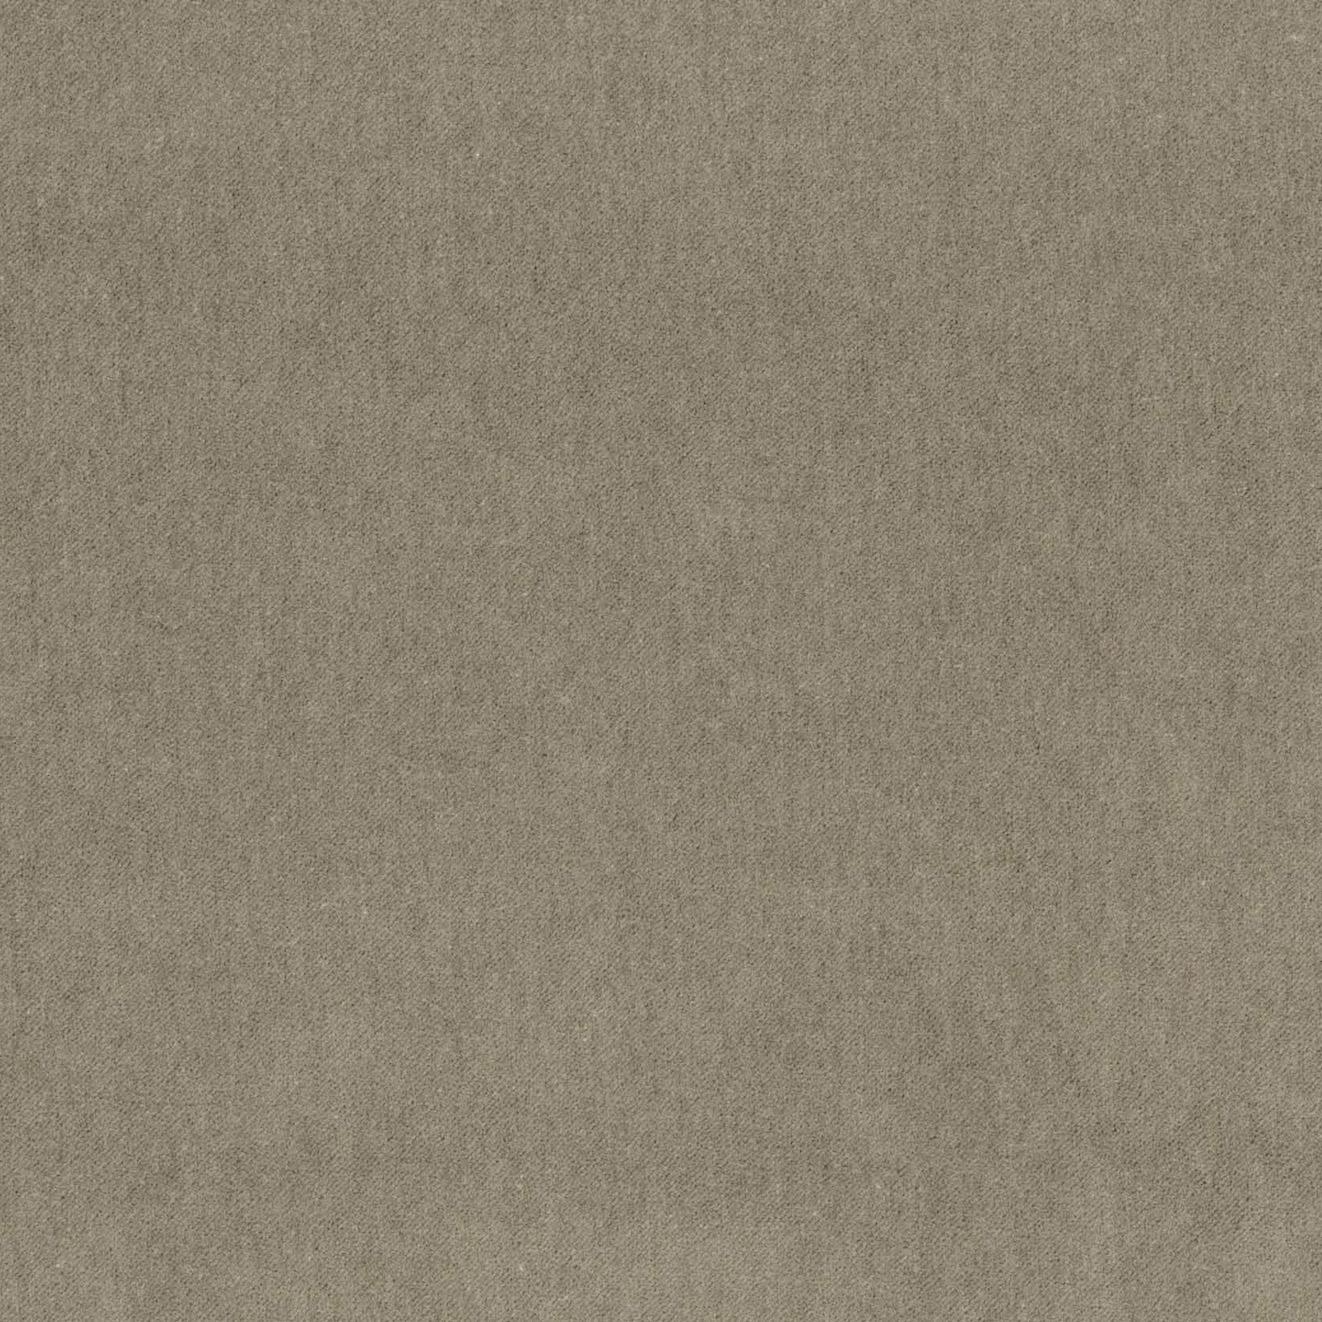 4 Malibu velvet gry beige